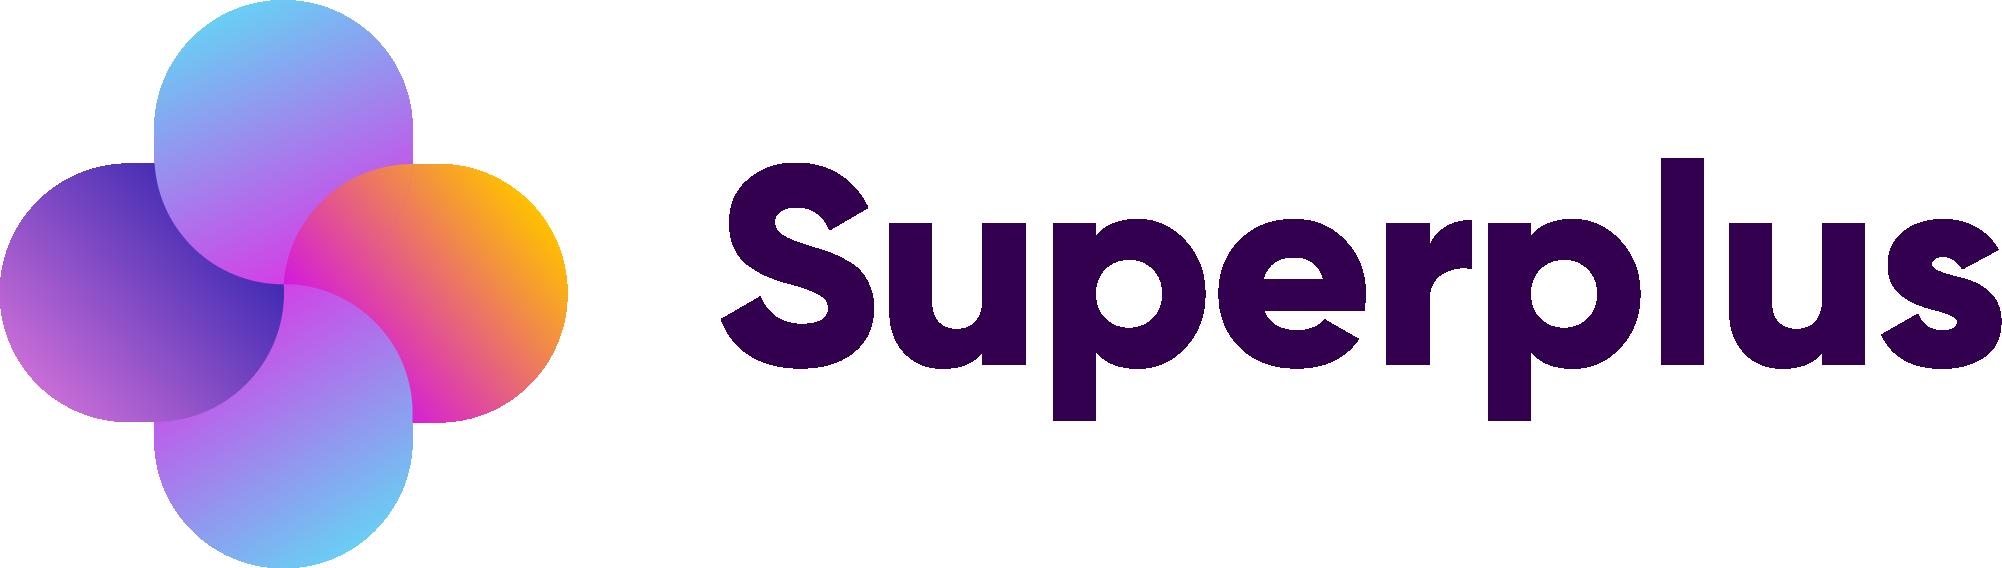 Superplus-logo-default-RGB-2